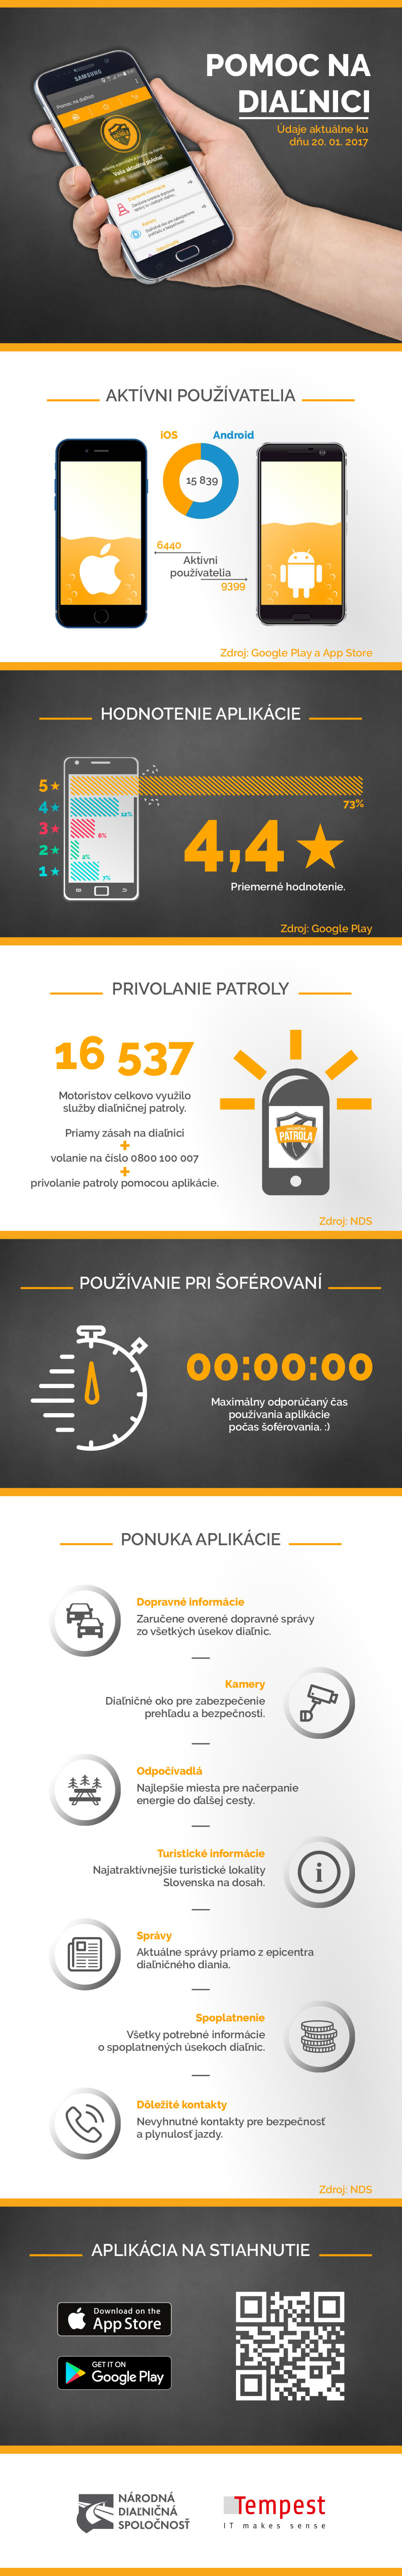 Infografika - aplikácia Pomoc na diaľnici